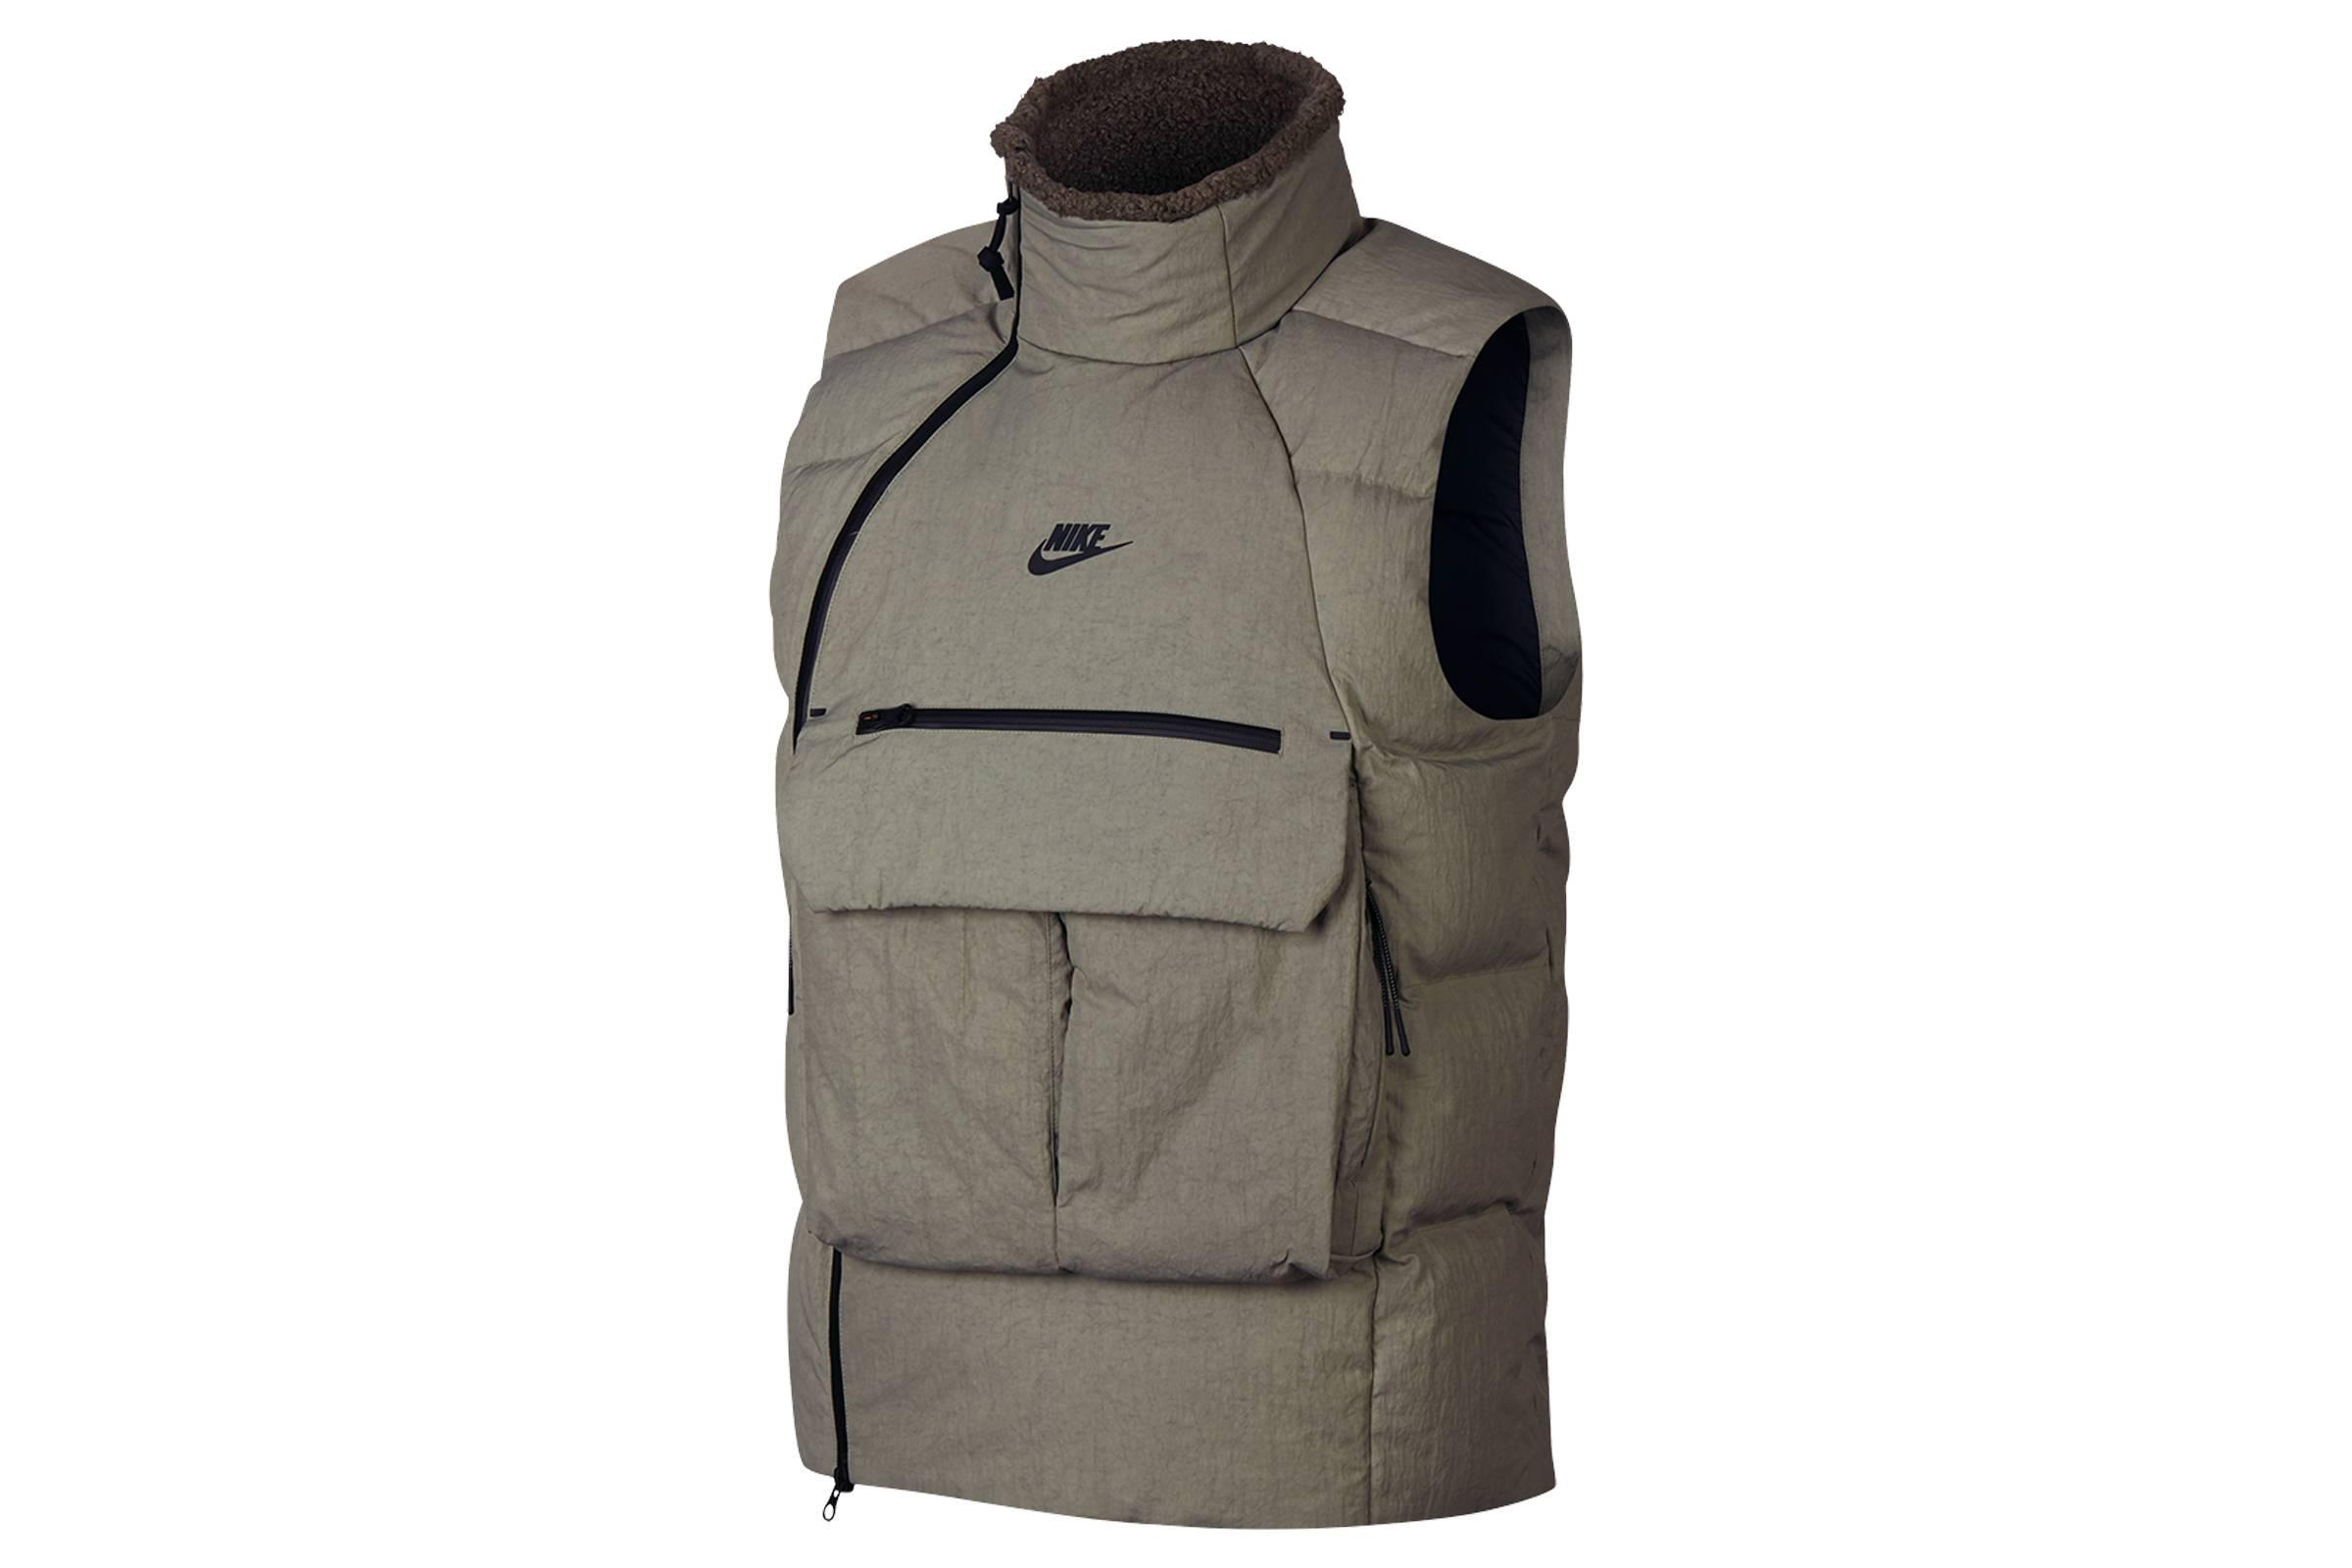 Nike Tech Pack Vest